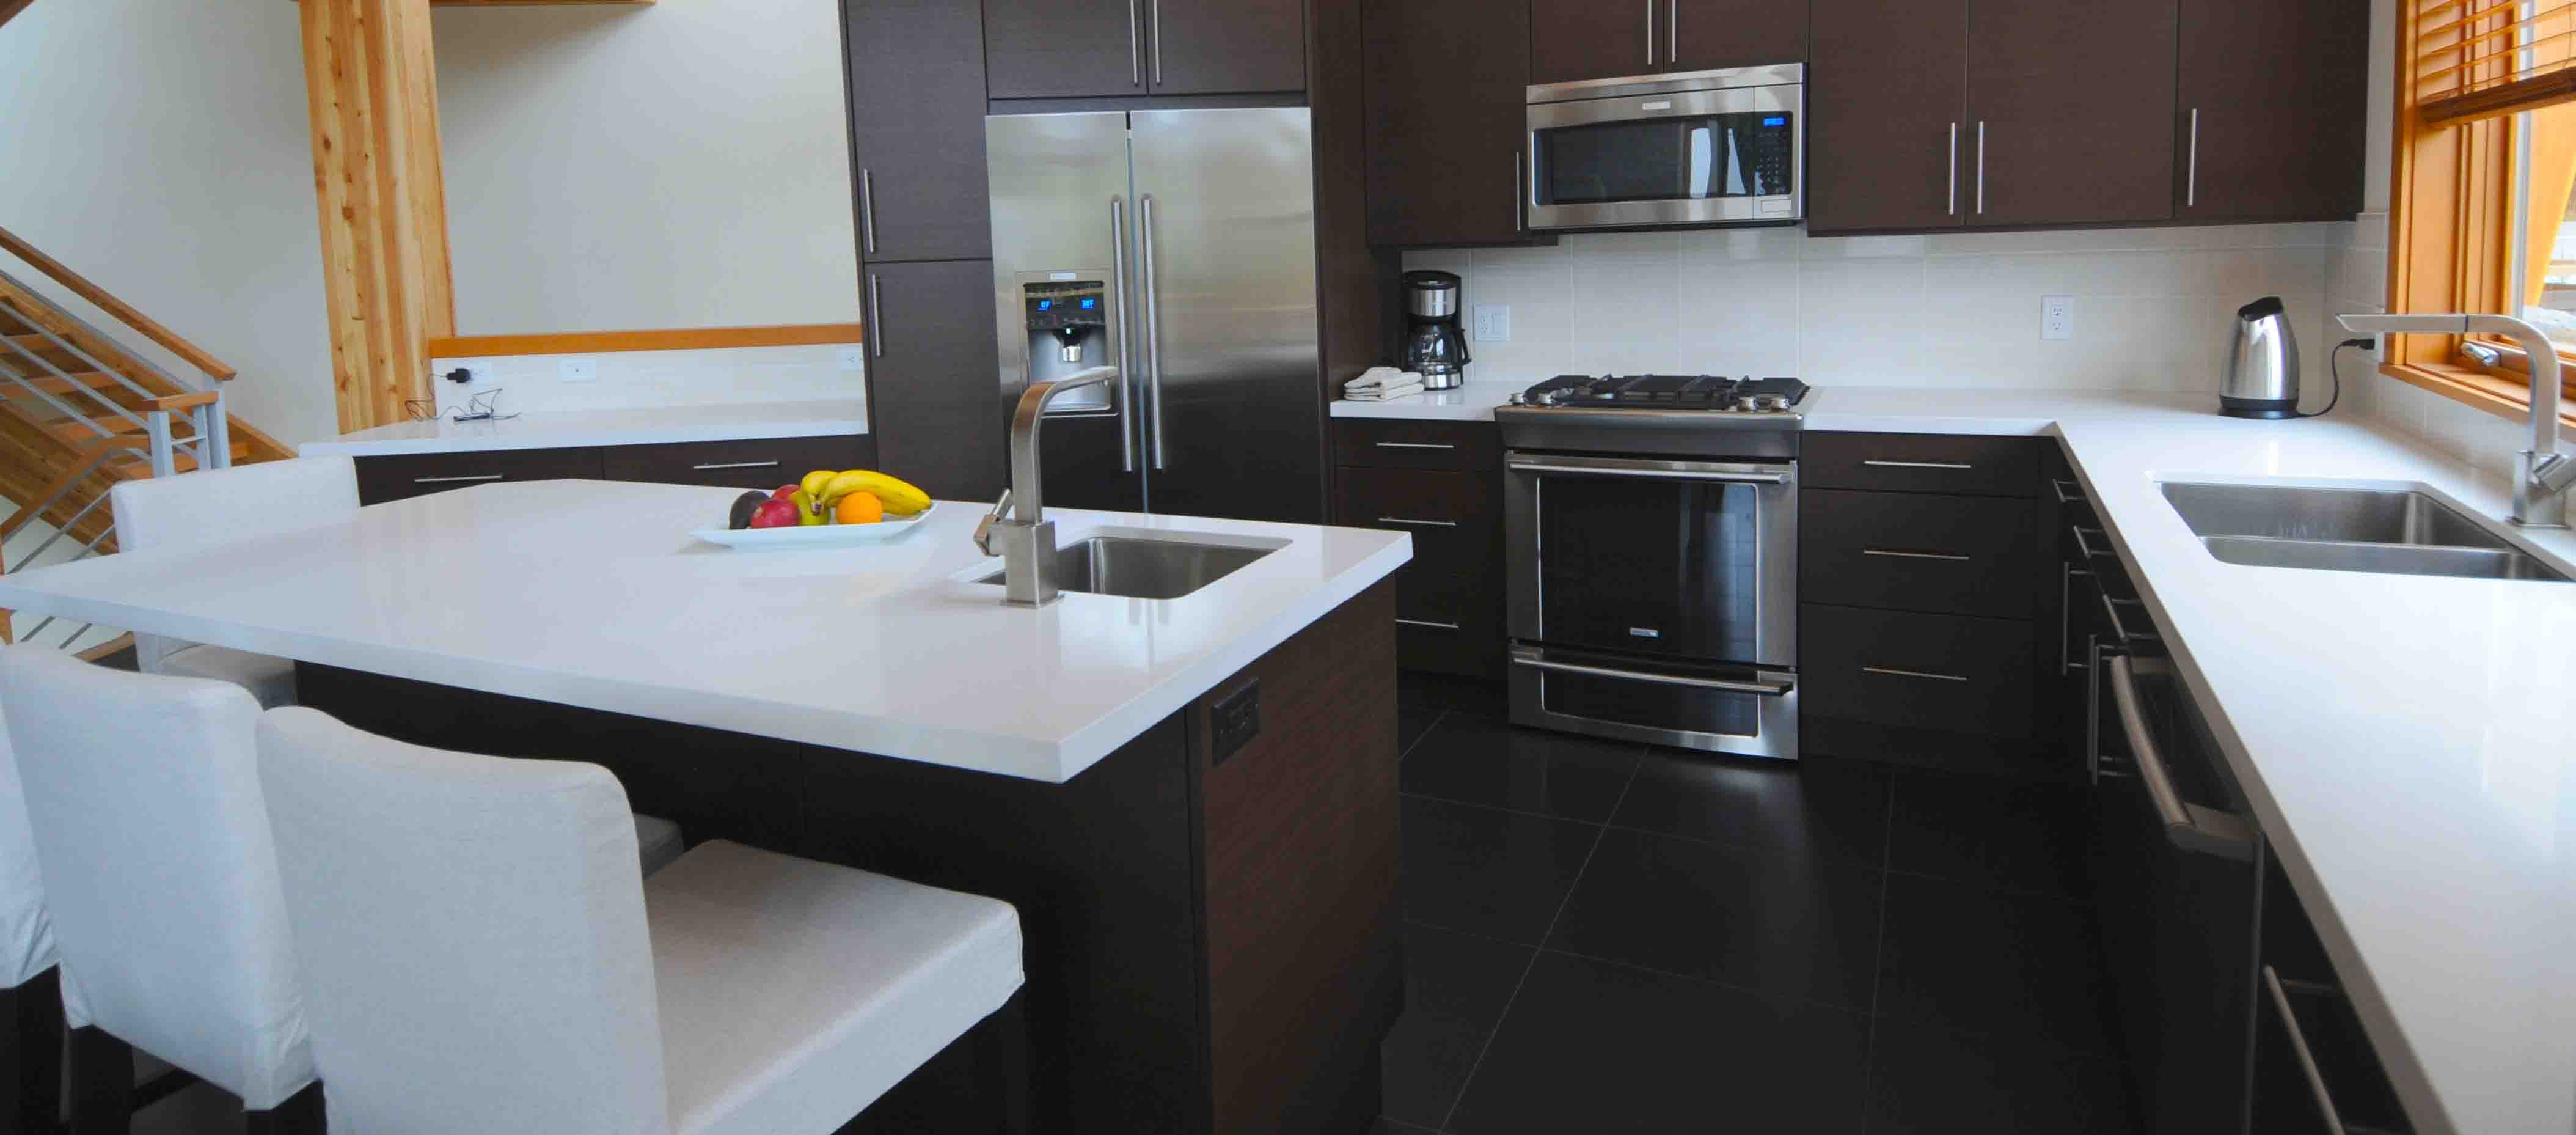 white kitchen countertops aid gas grill quartz